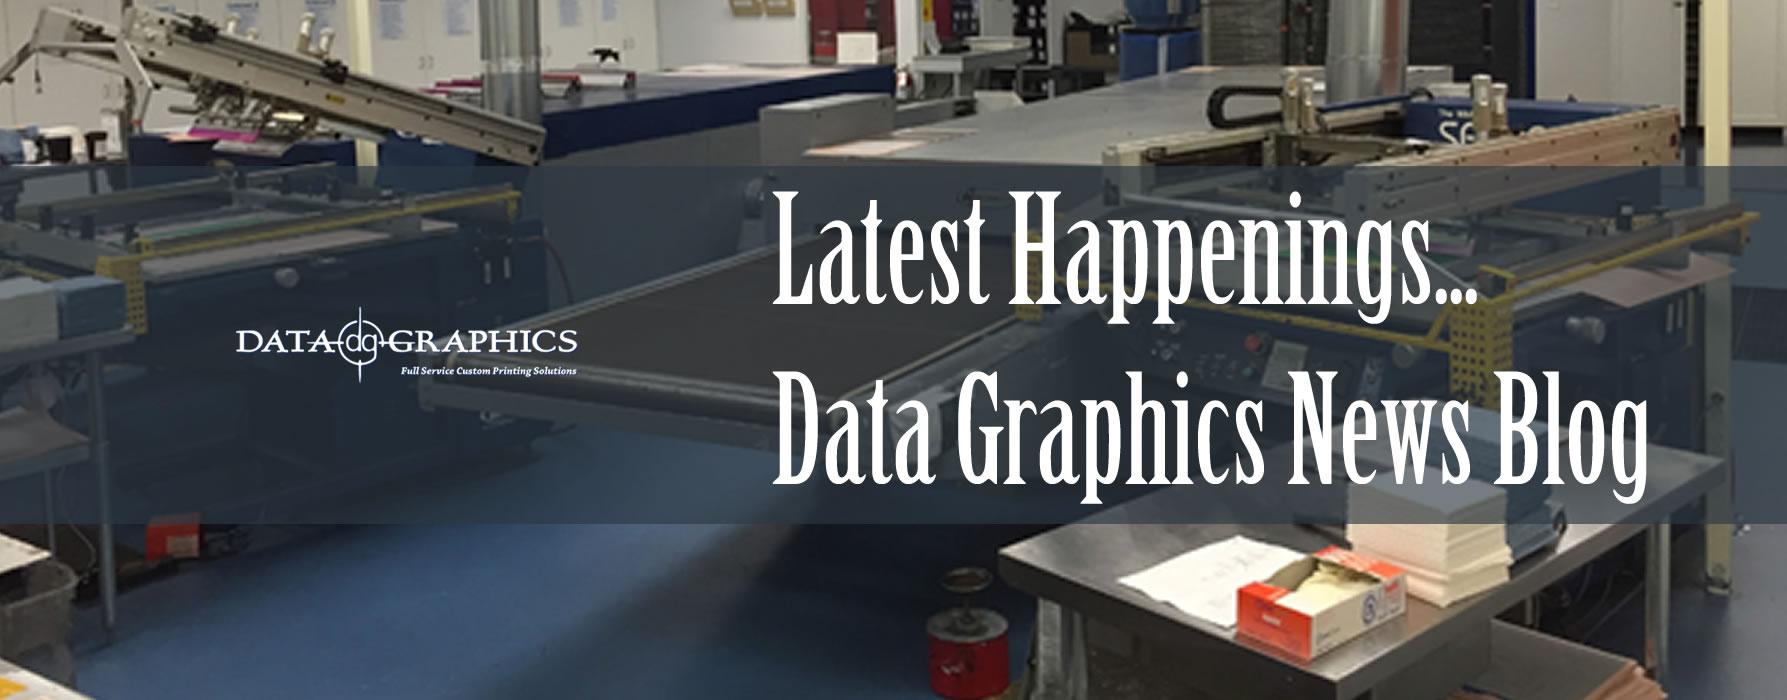 Data Graphics Latest Happenings - Blog